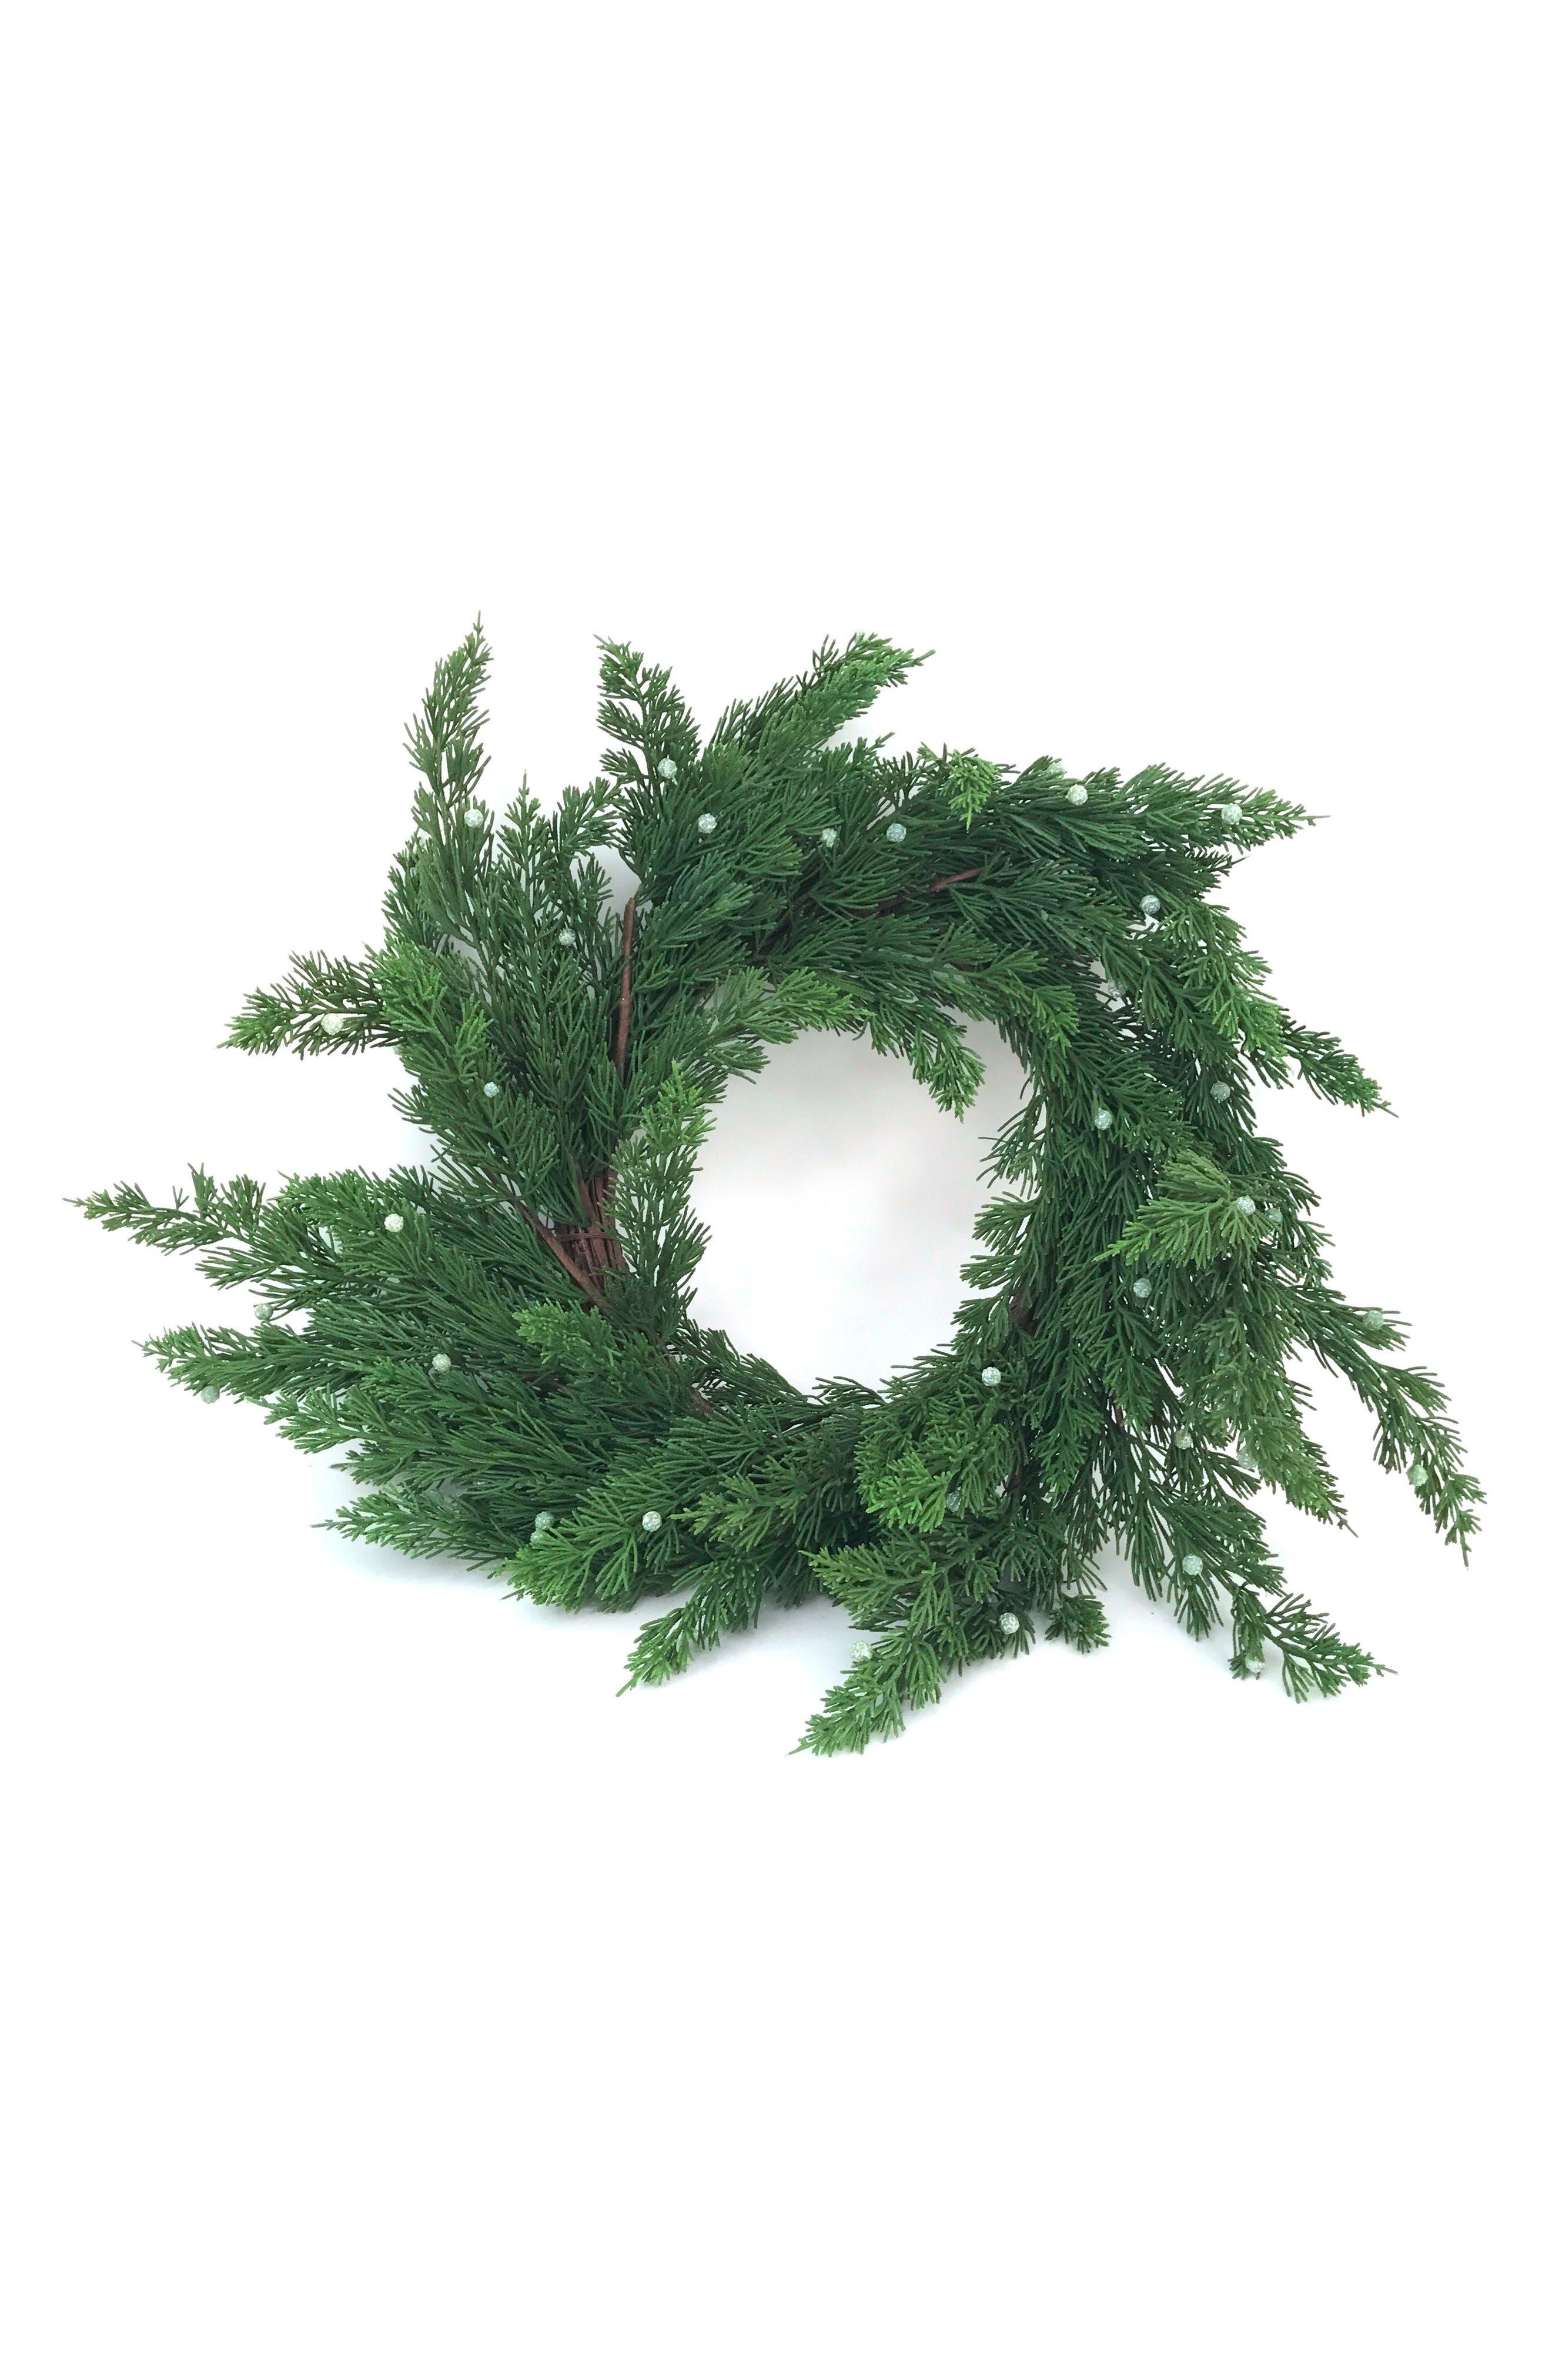 Alternate Image 1 Selected - Arty Pine Wreath with Juniper Berries